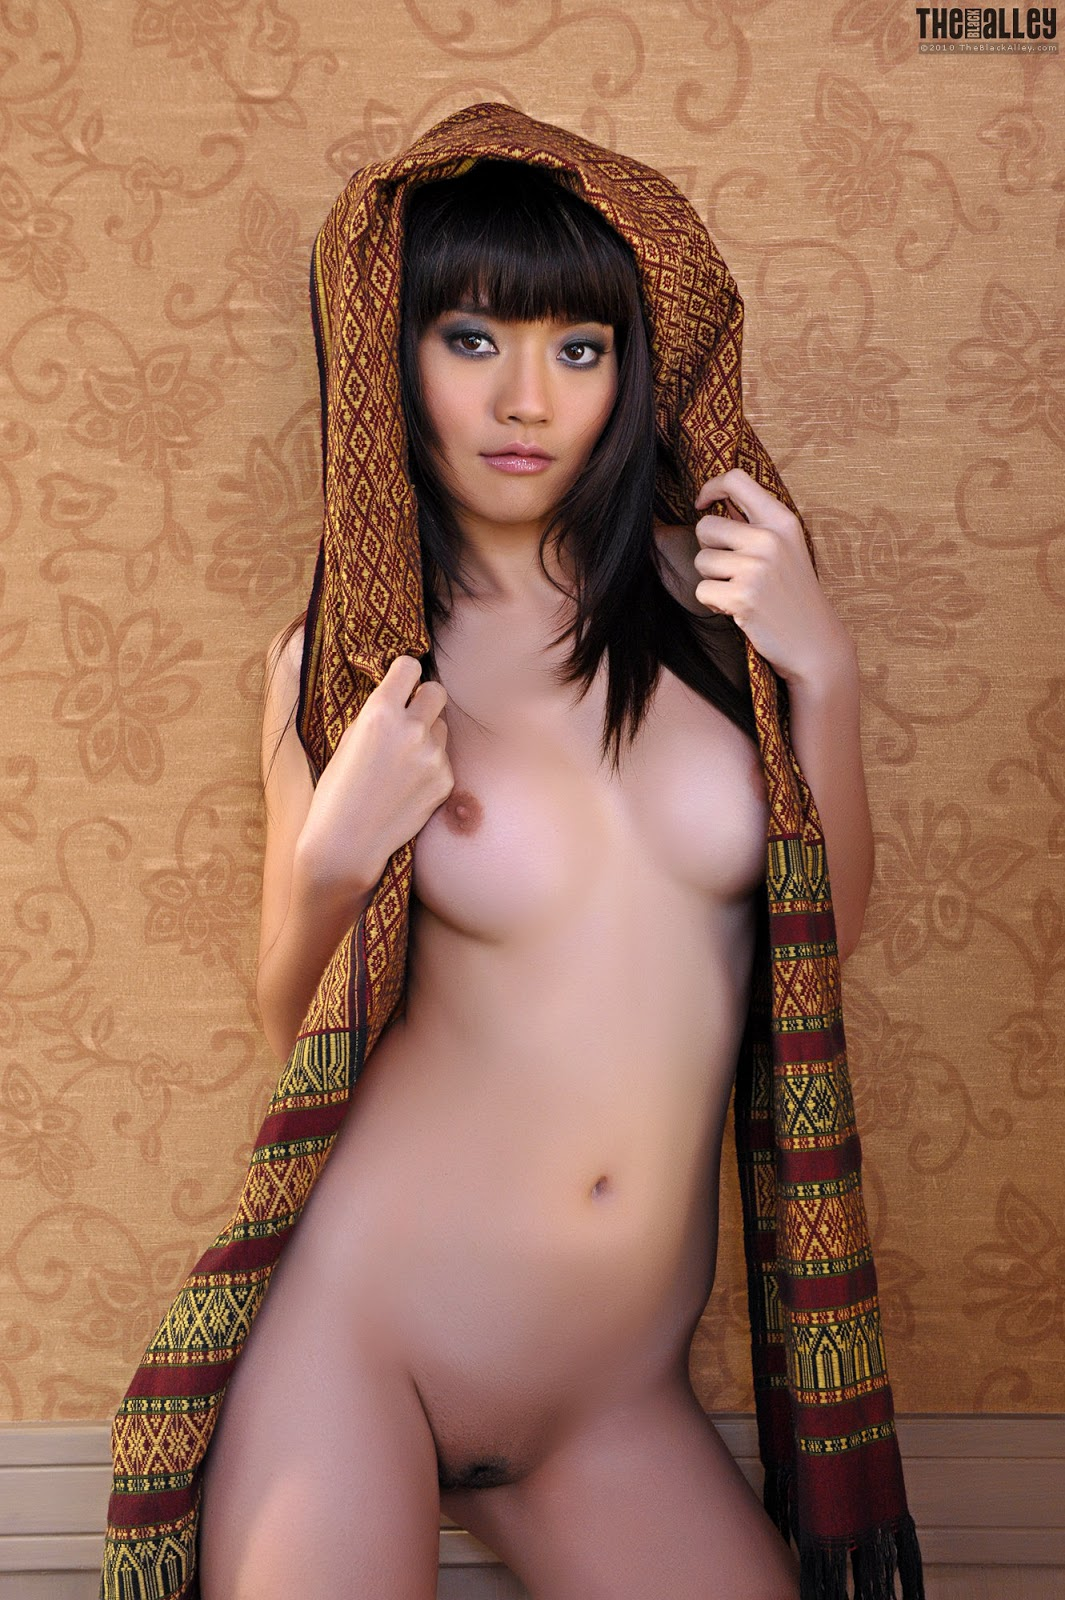 alternative girls nude hd